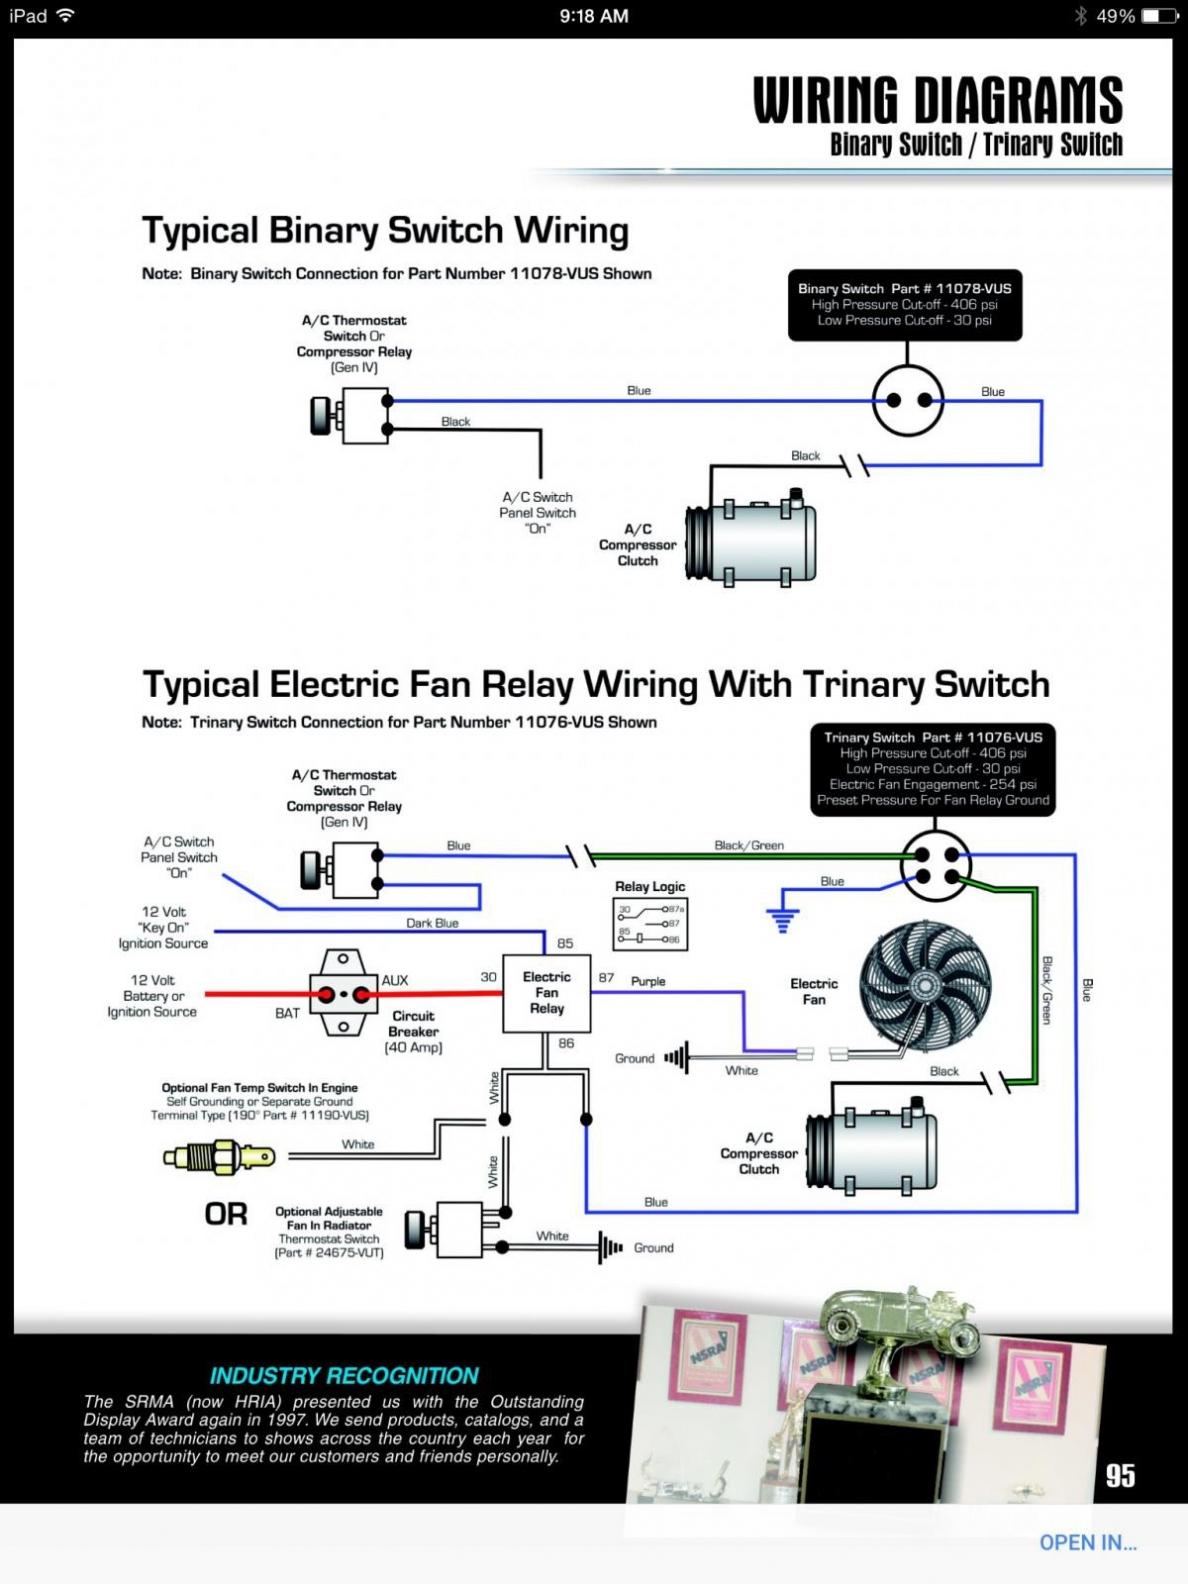 Vintage Air Gen Iv Wiring Diagram   Wiring Library - Vintage Air Wiring Diagram